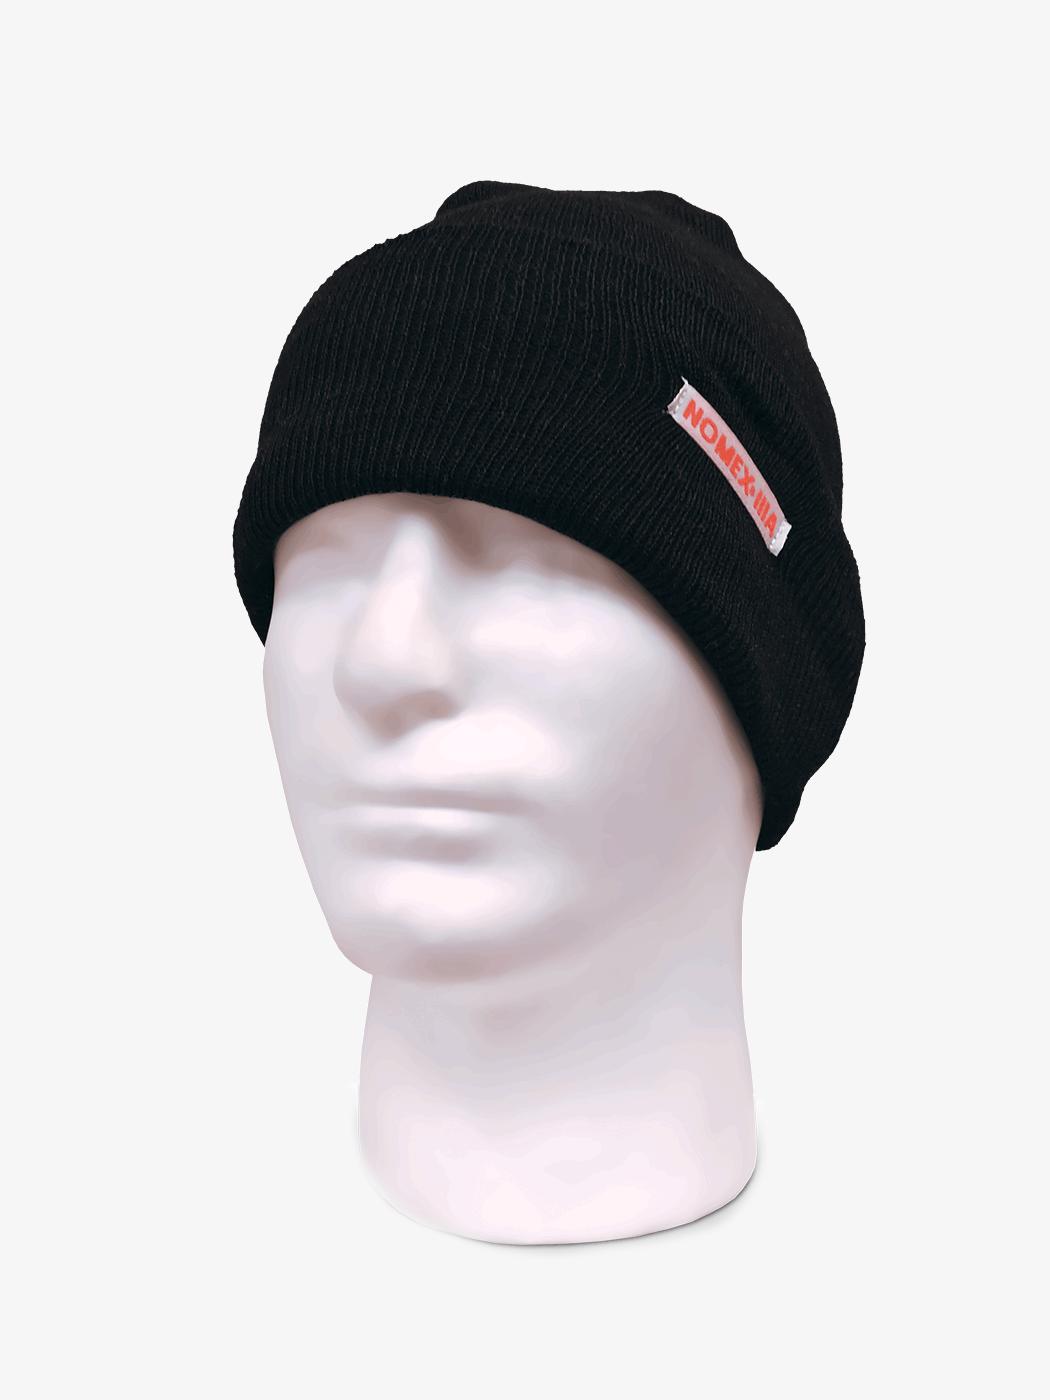 Nomex®IIIA Knit Rib Folded Toque – Style J63